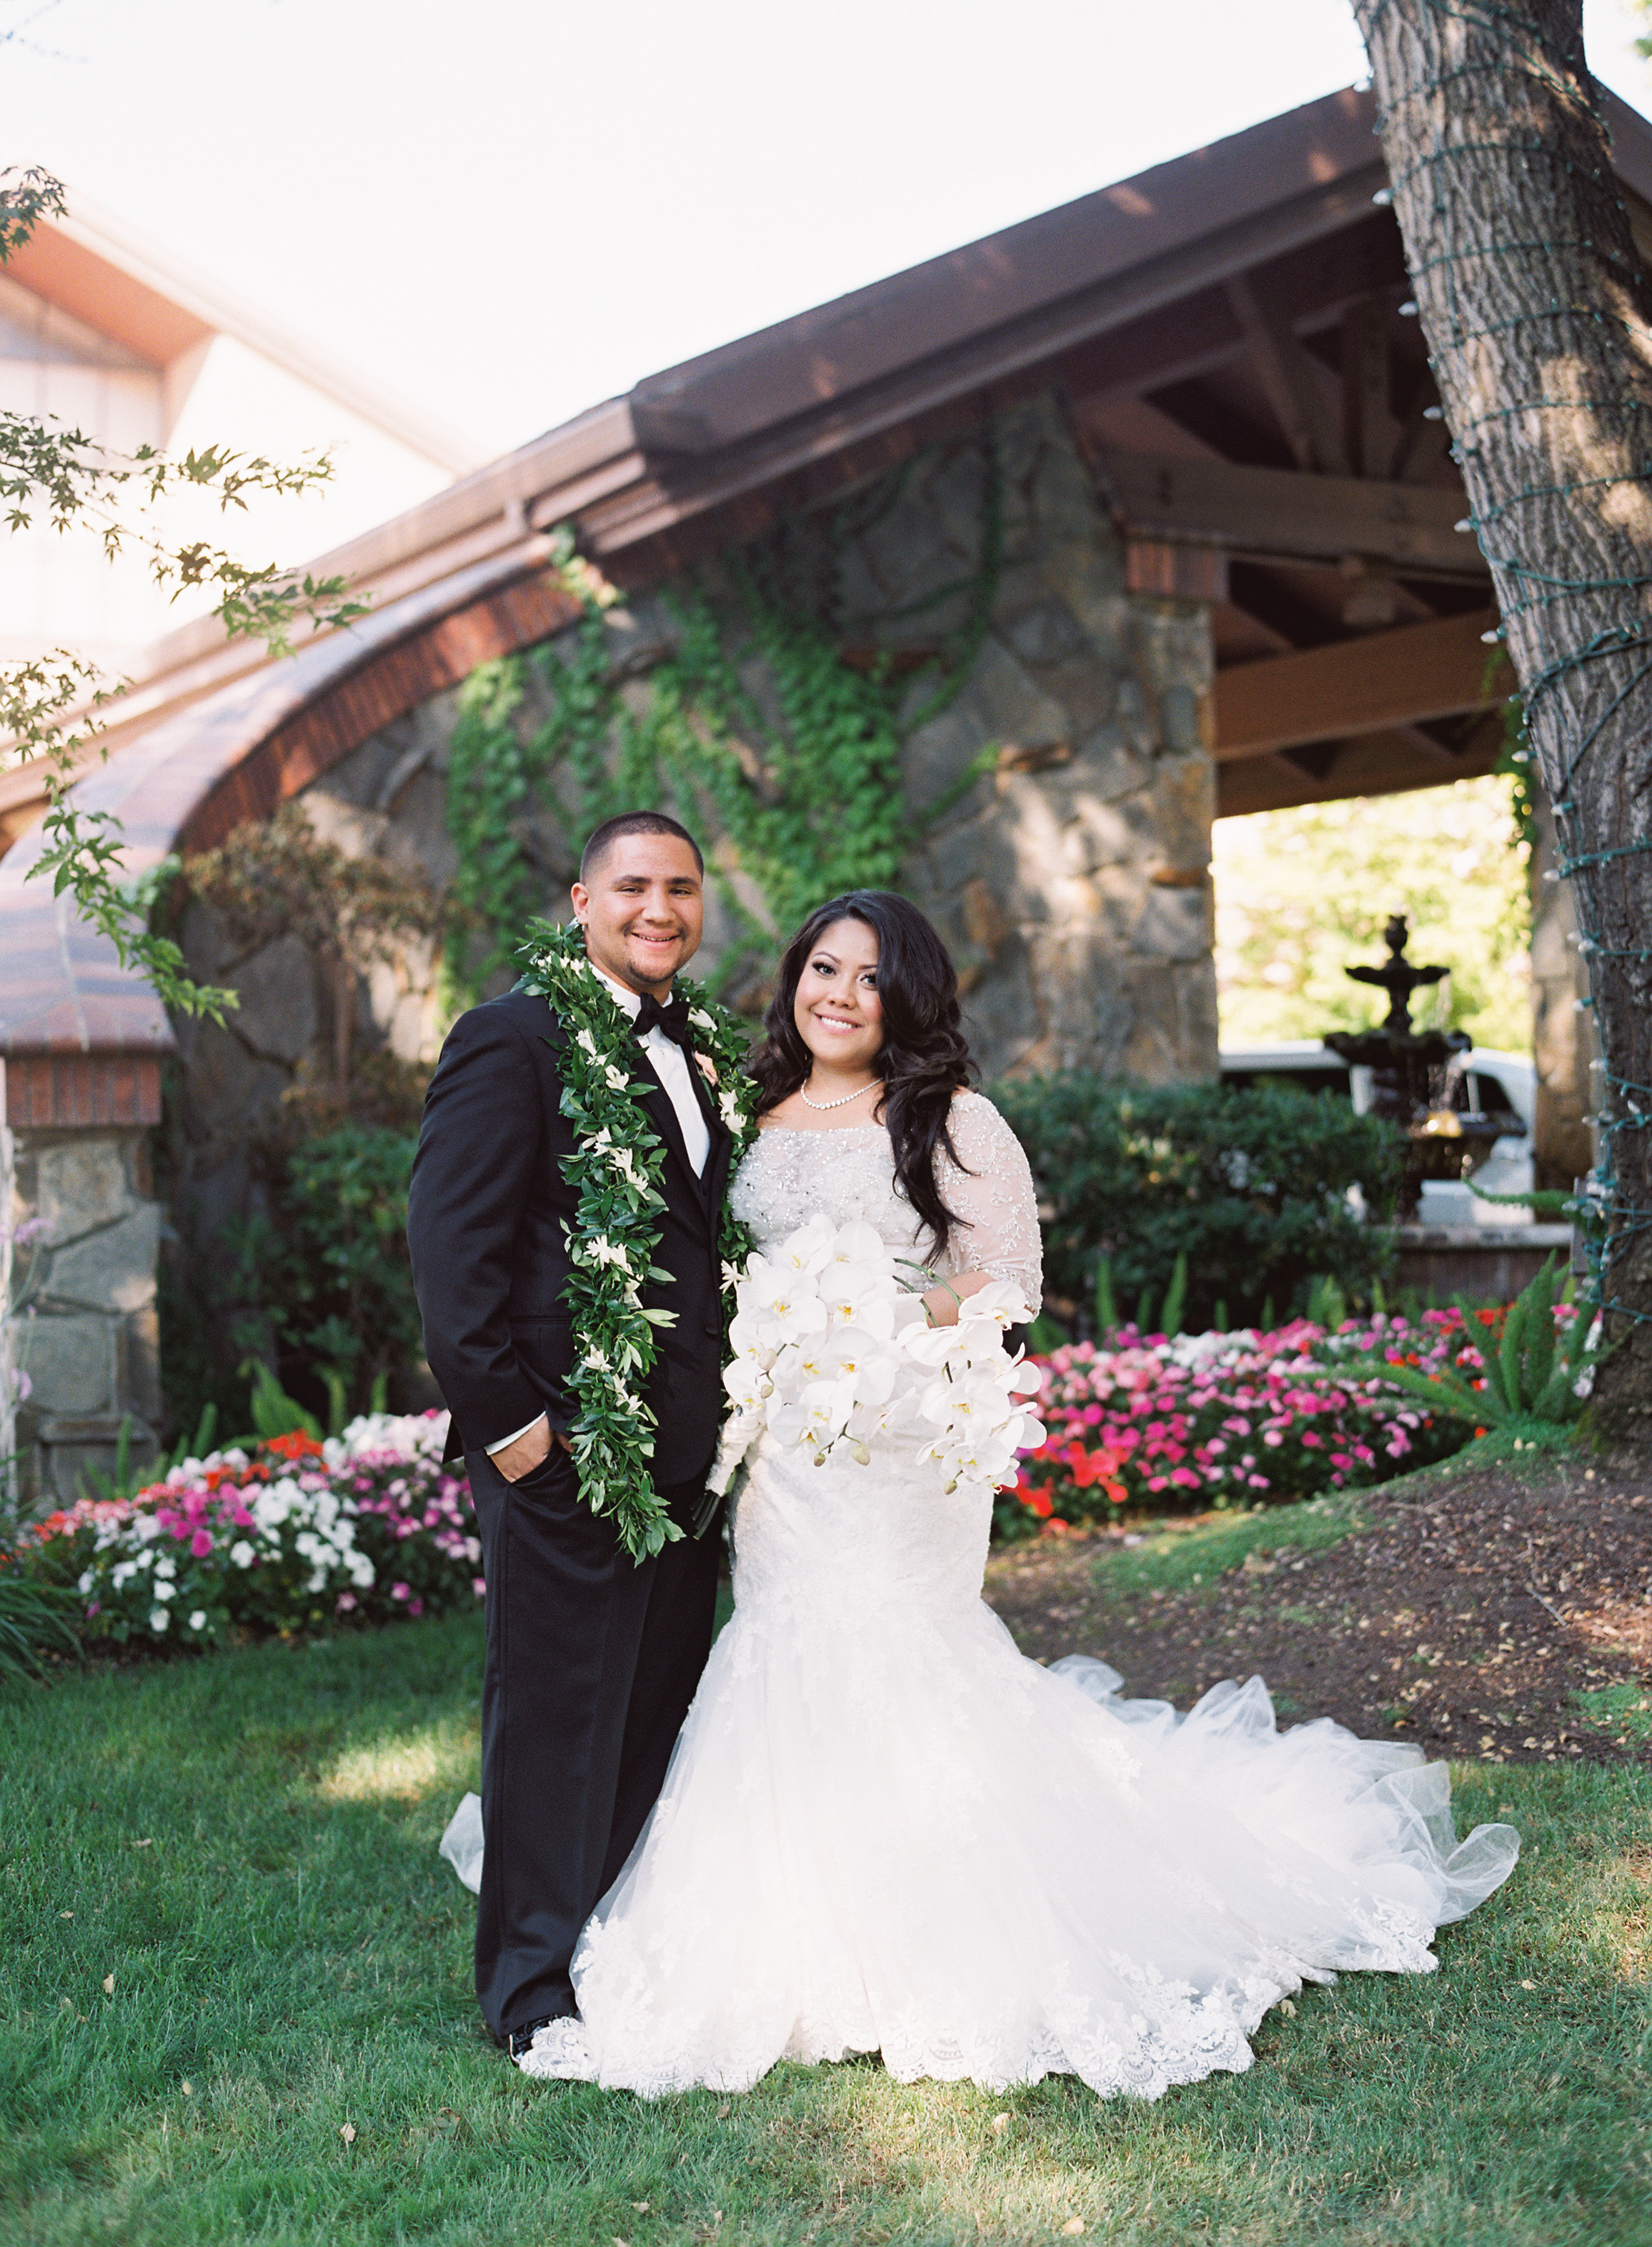 hawaiian-inspired-wedding-in-danville-california-006.jpg